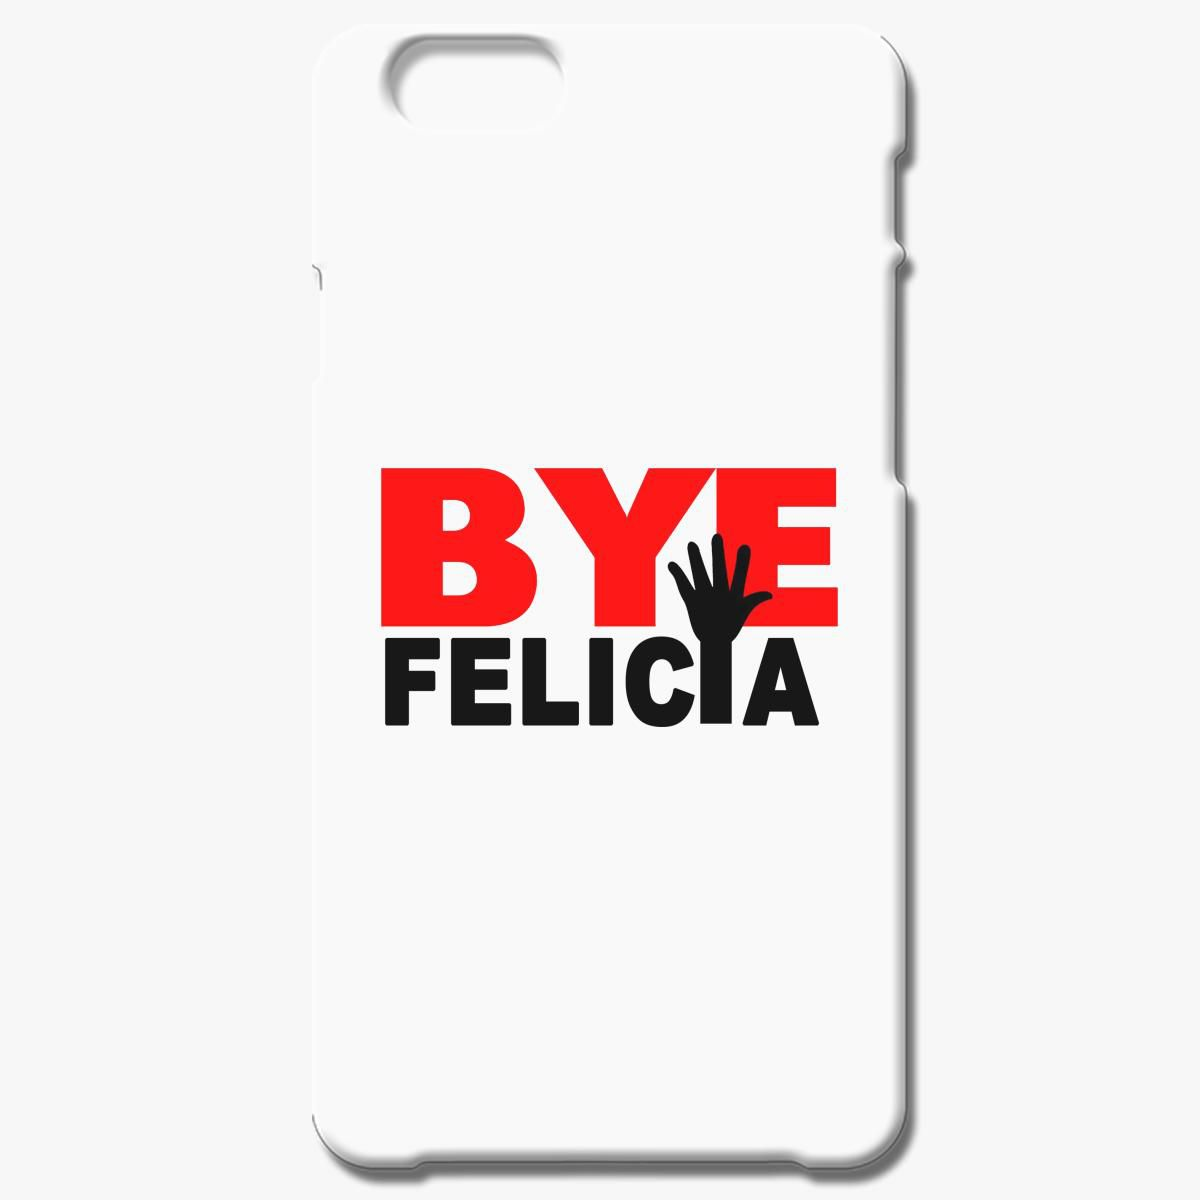 Bye Felicia Iphone 6 6s Plus Case